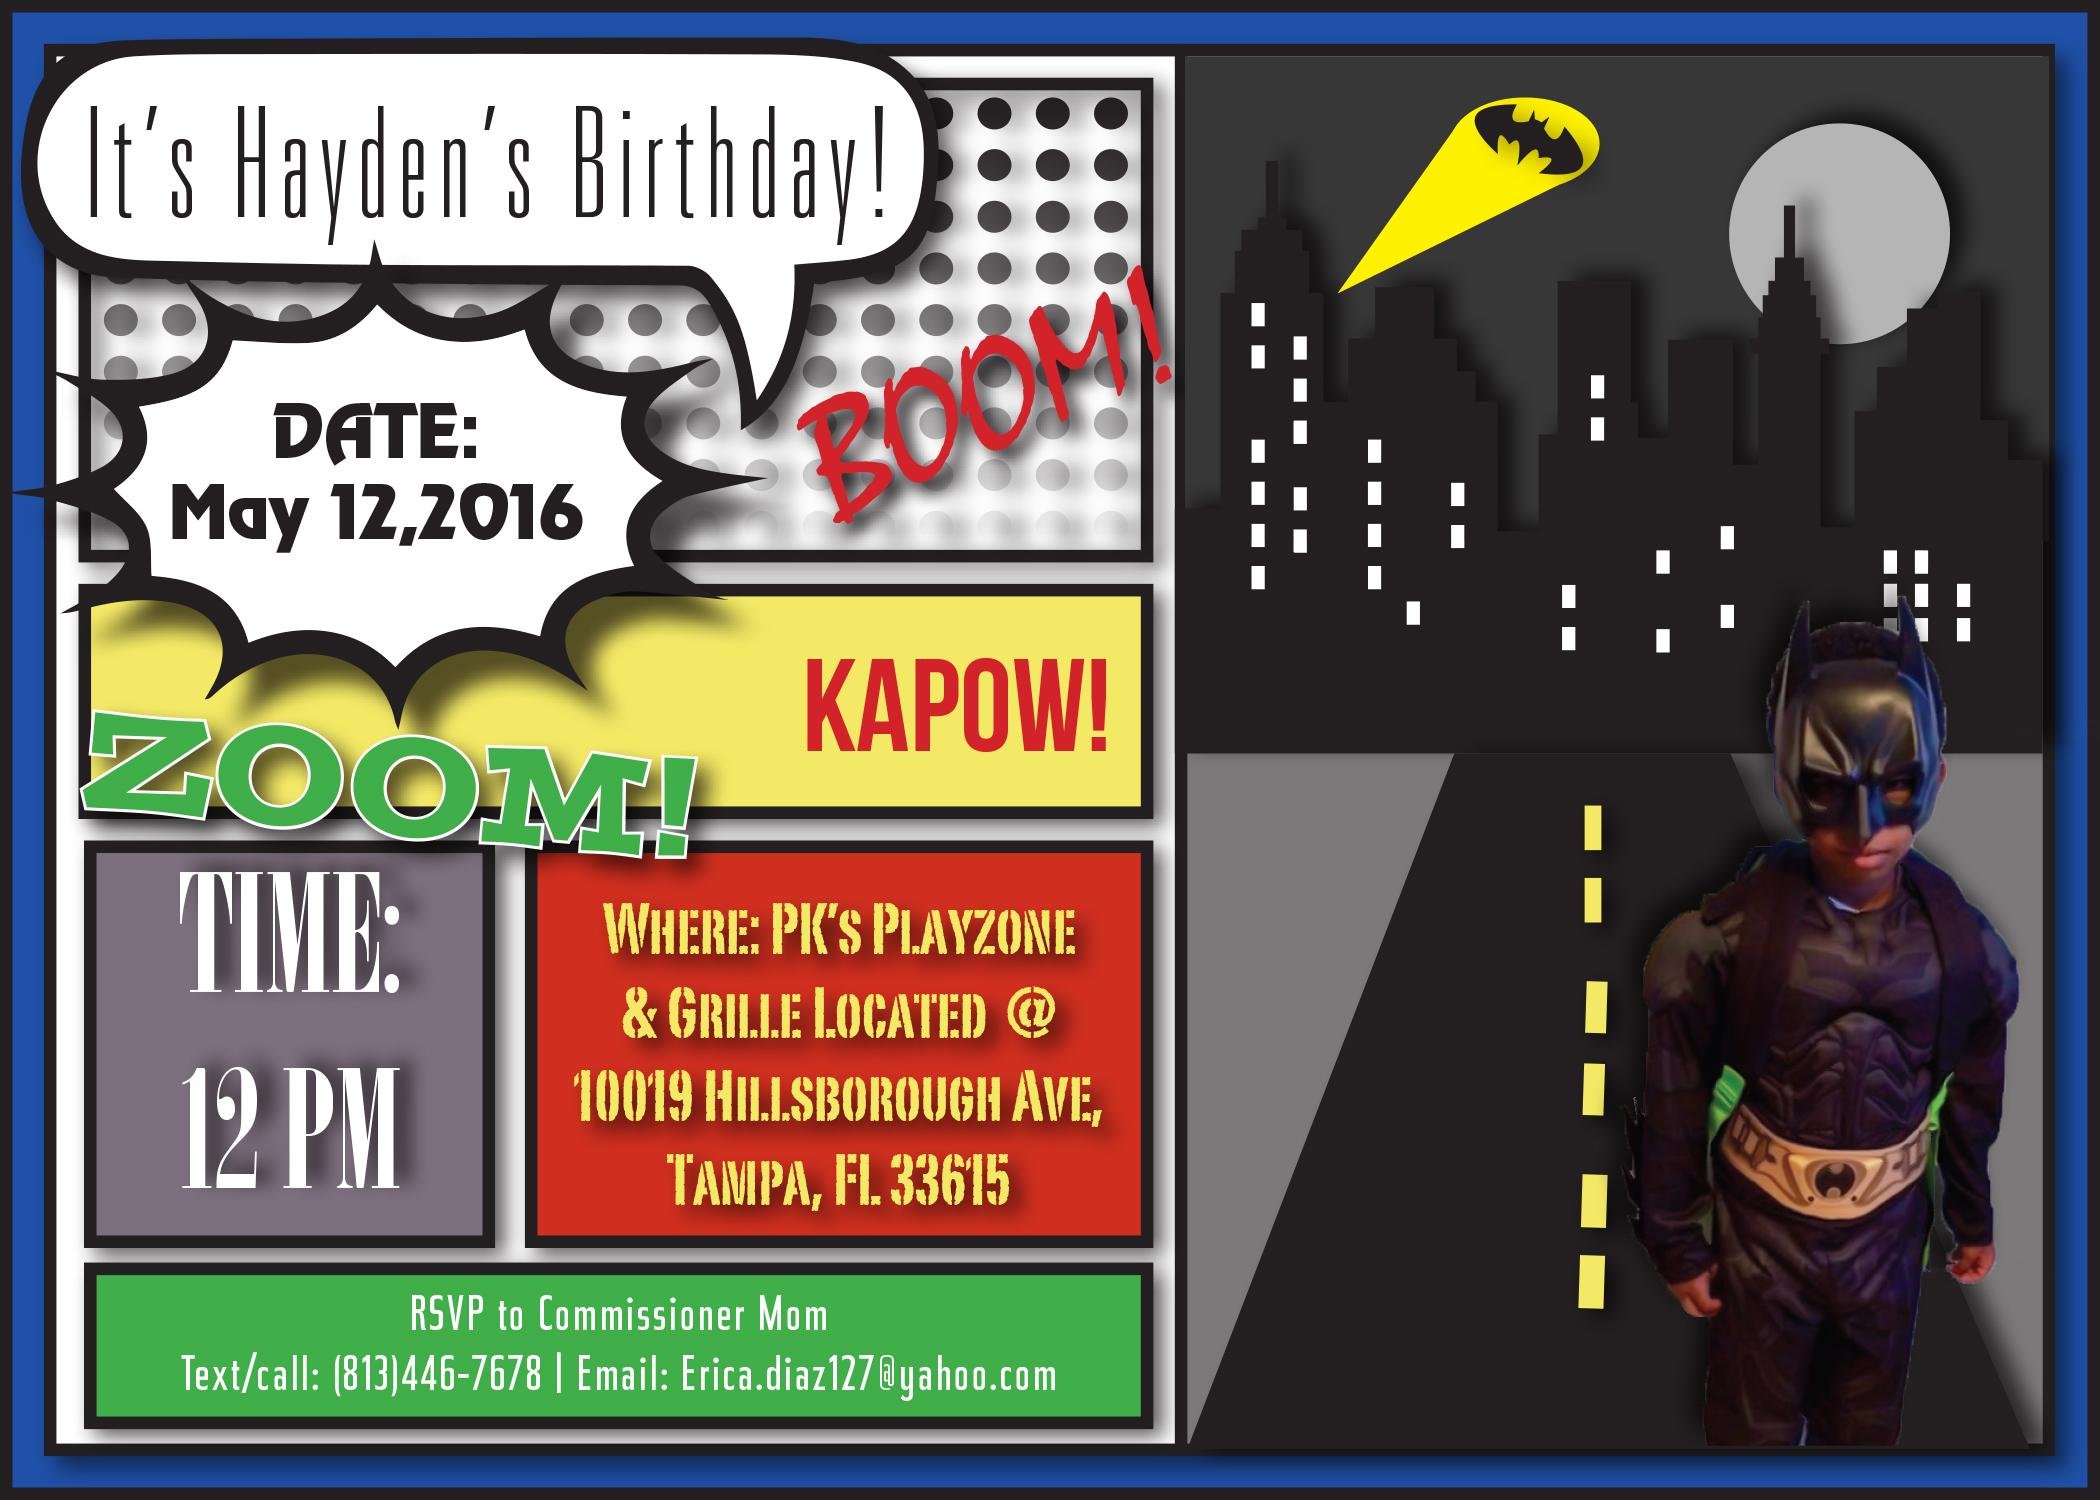 Hayden_bday_card.jpg